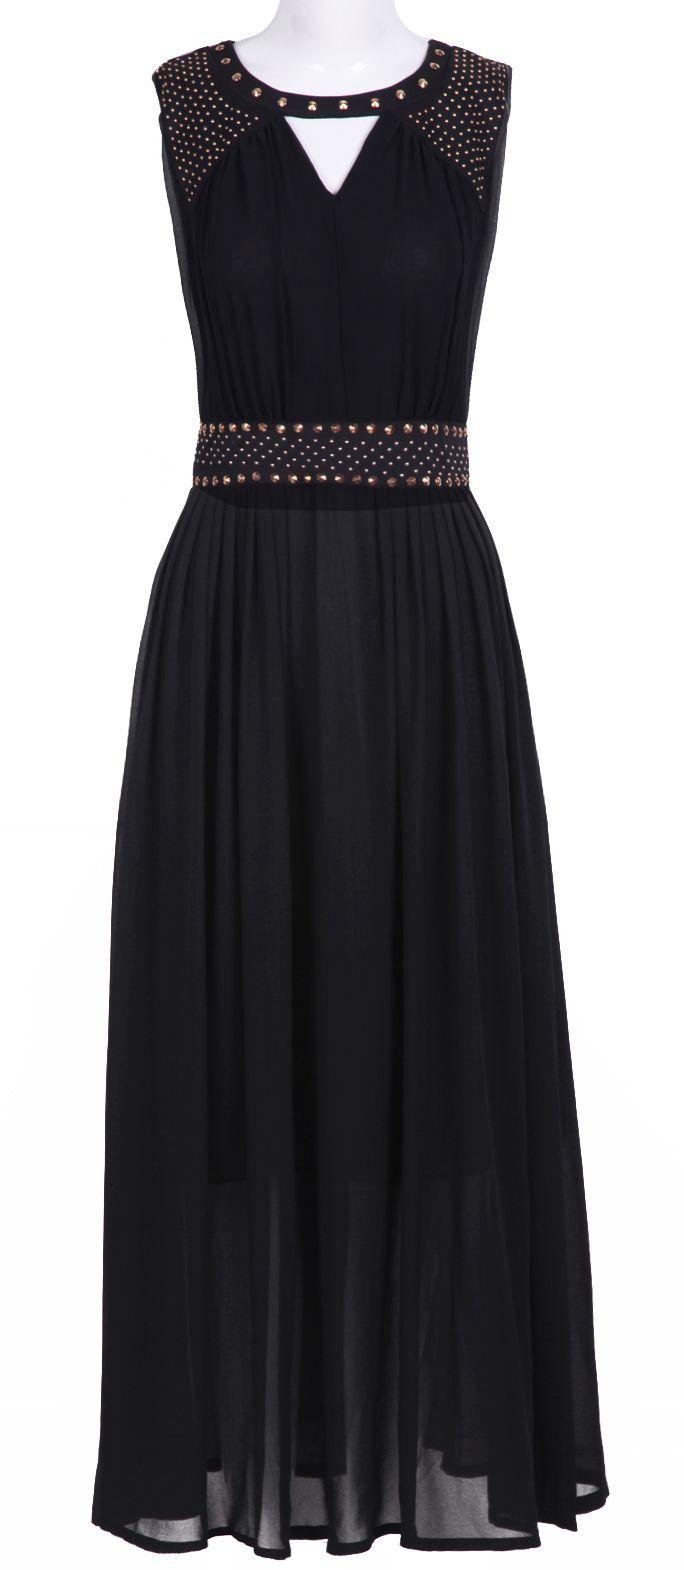 Black Sleevelss Cut Out Rivet Embellished Long Dress